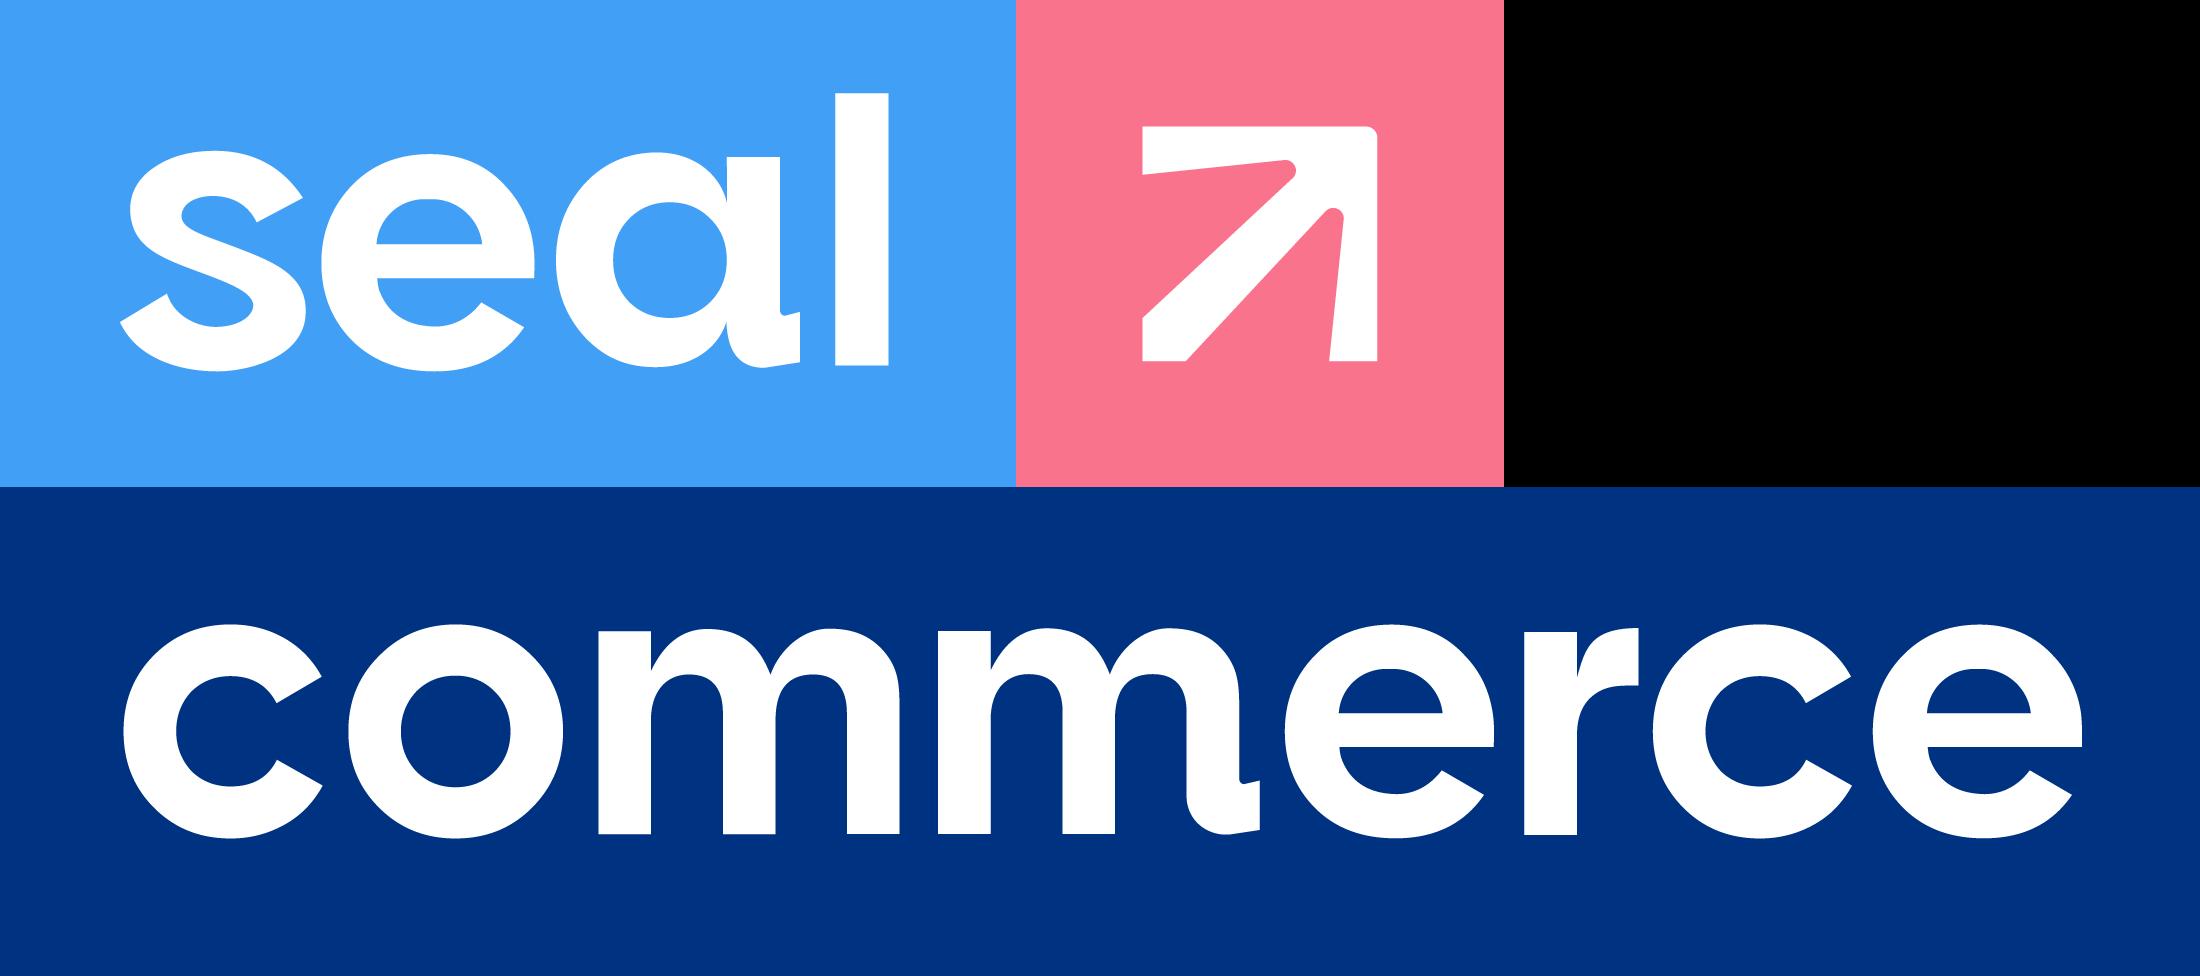 Seal Commerce